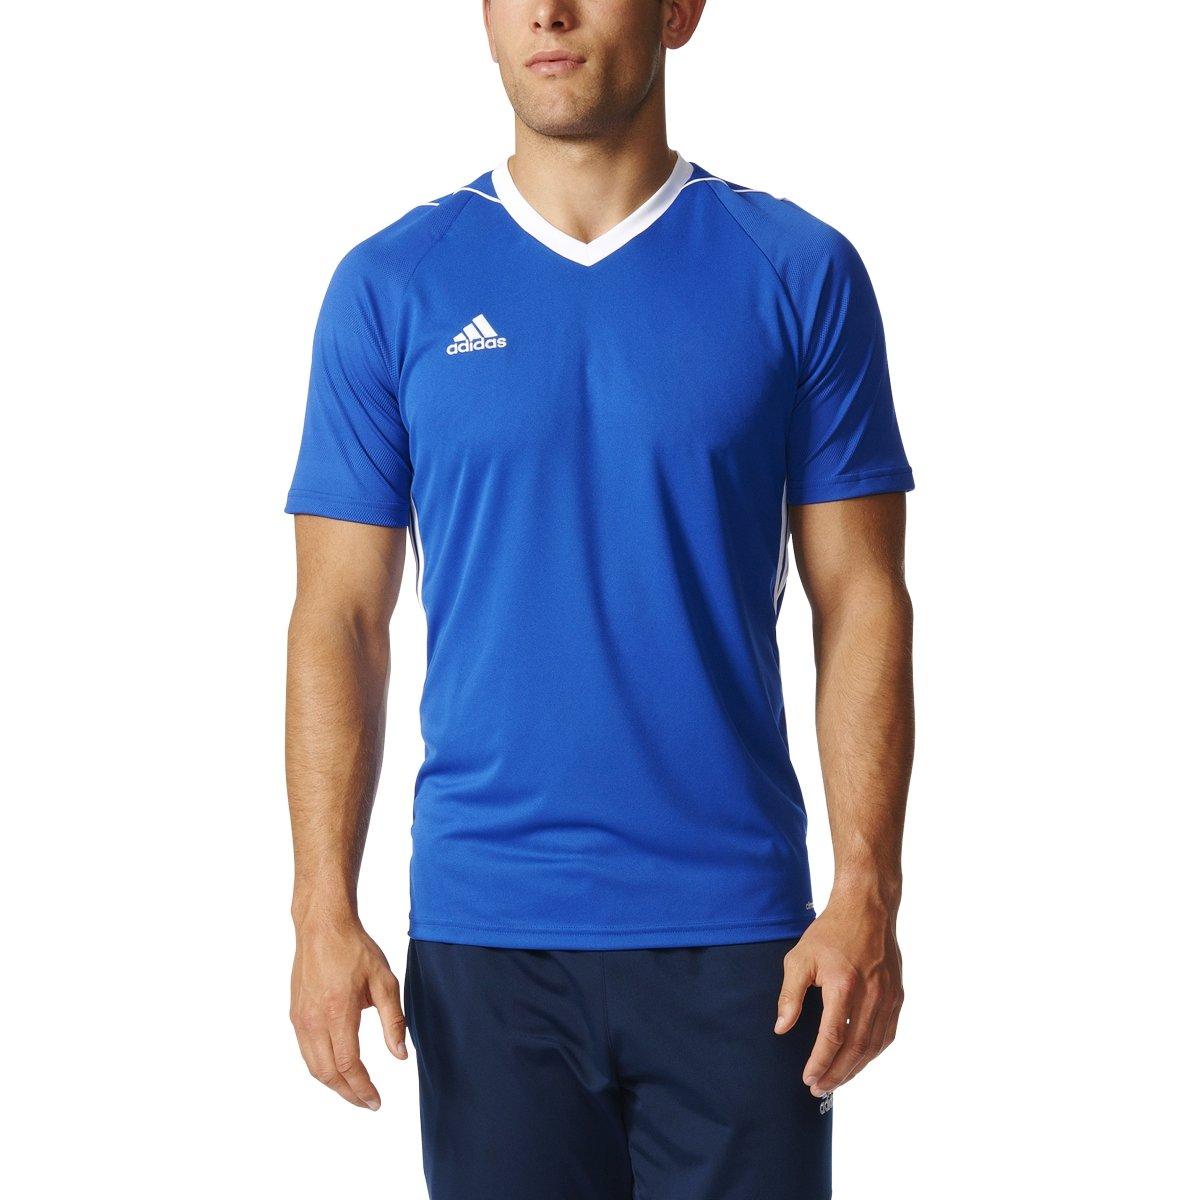 Adidas Tiro 17 Mens Soccer Jersey XS Bold Blue/White by adidas